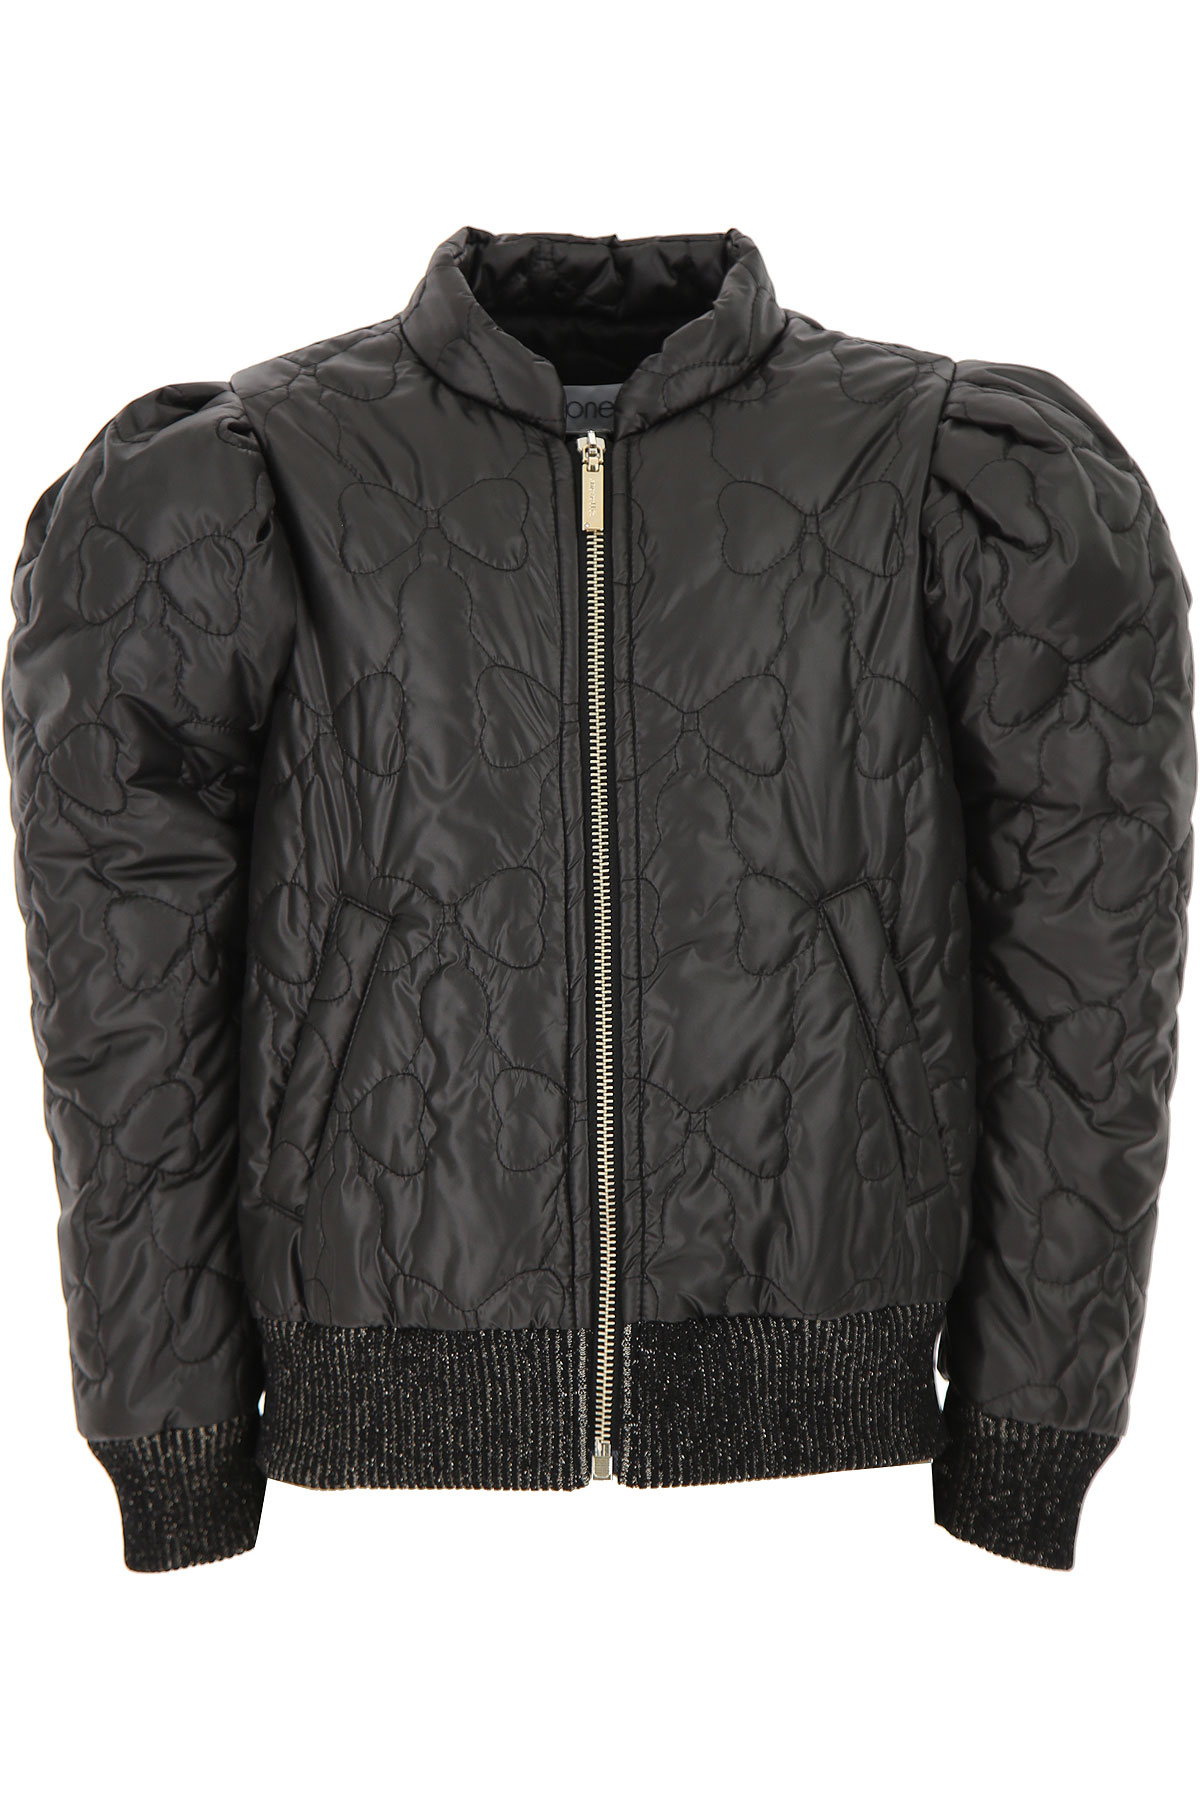 Simonetta Girls Down Jacket for Kids, Puffer Ski Jacket On Sale, Black, polyester, 2019, 10Y 6Y 8Y